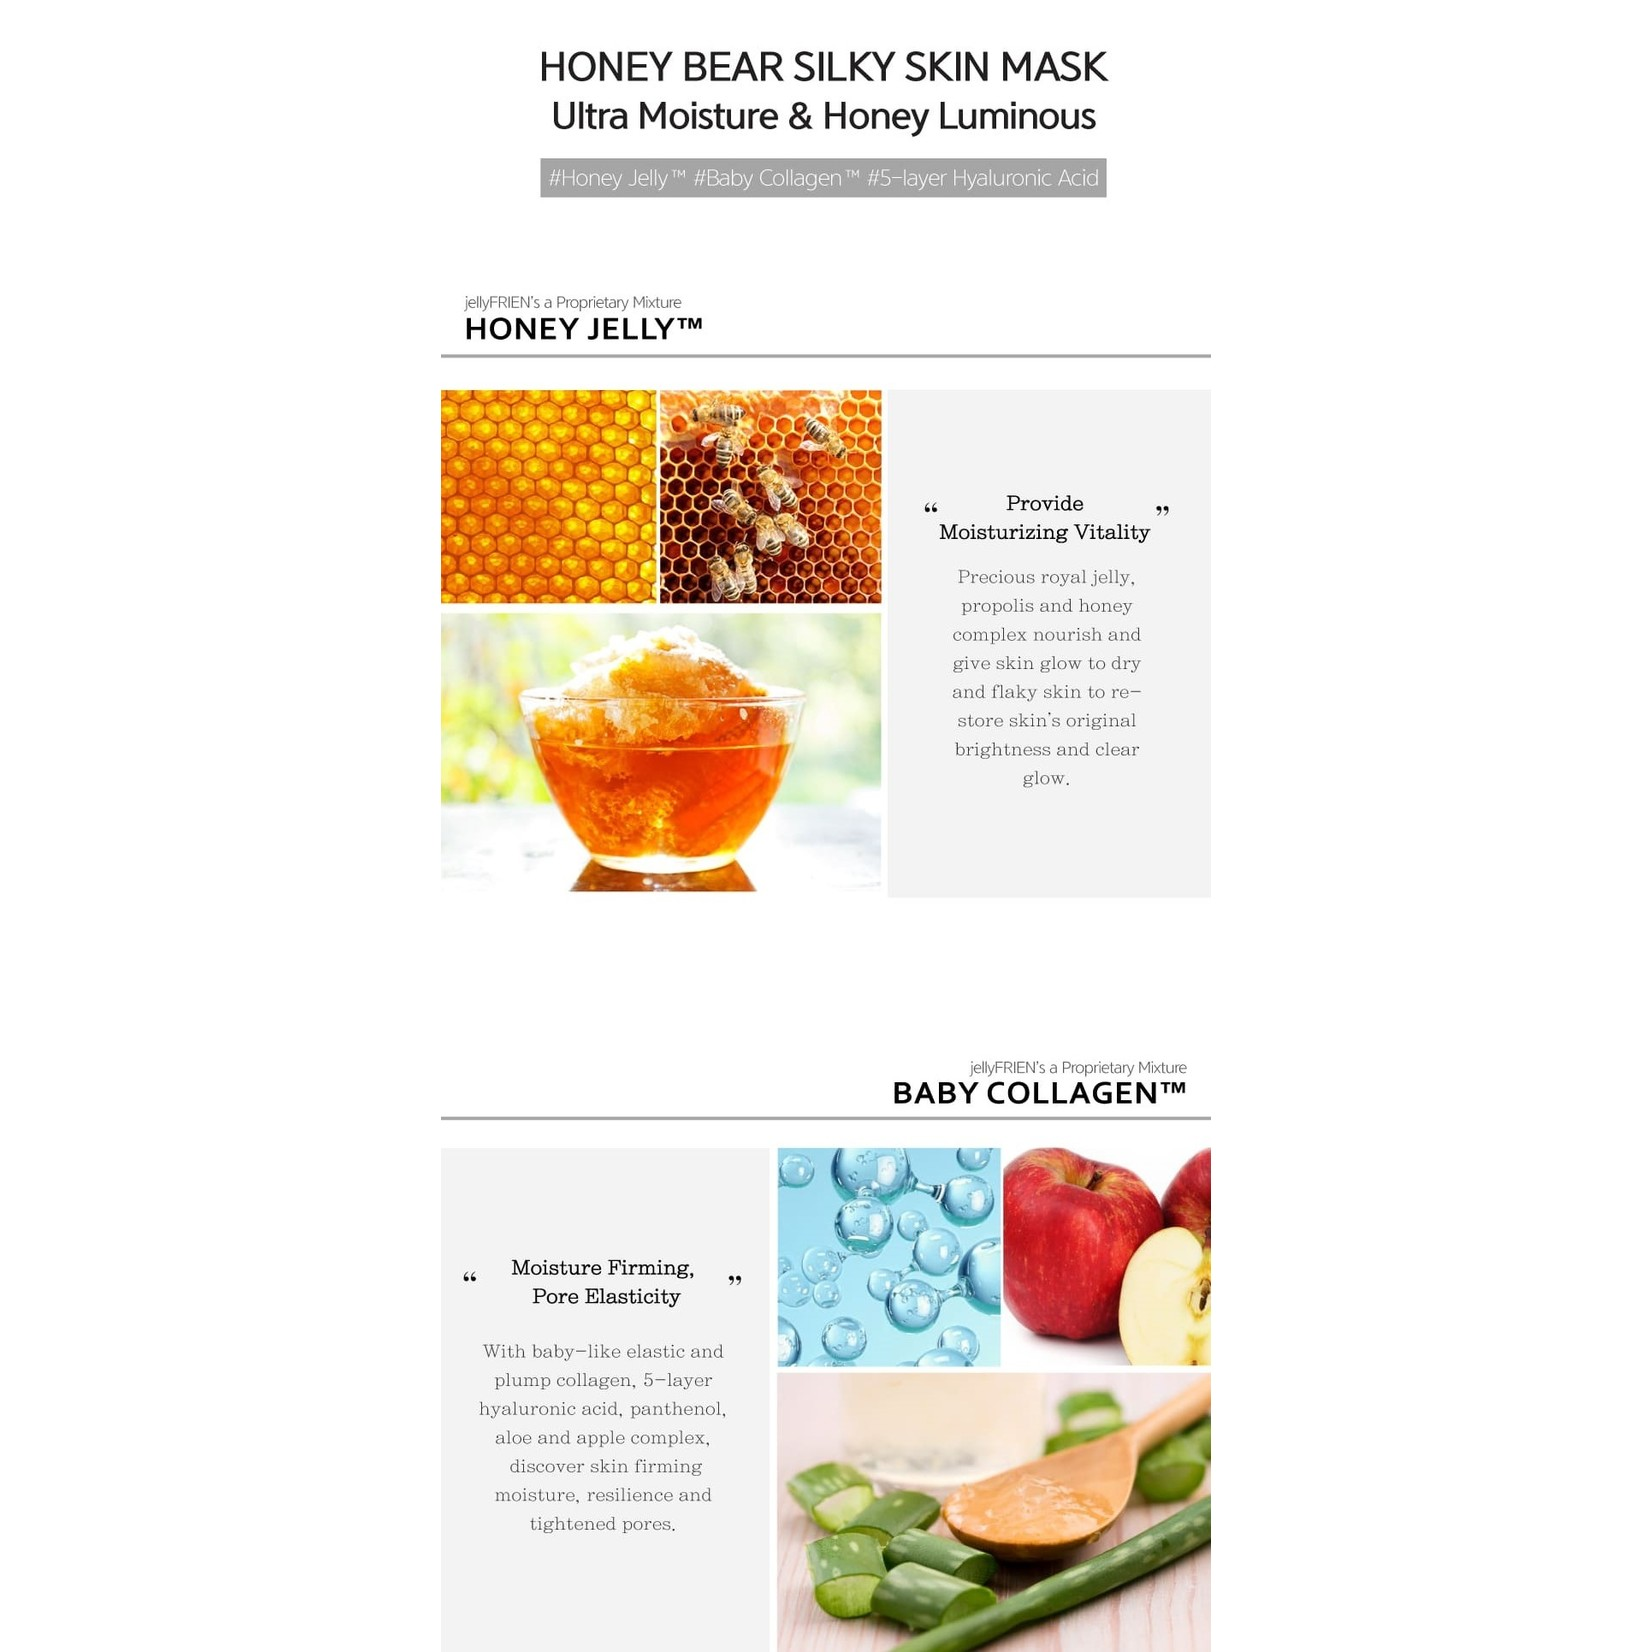 FRIENVITA Honey Bear Silky Skin Mask